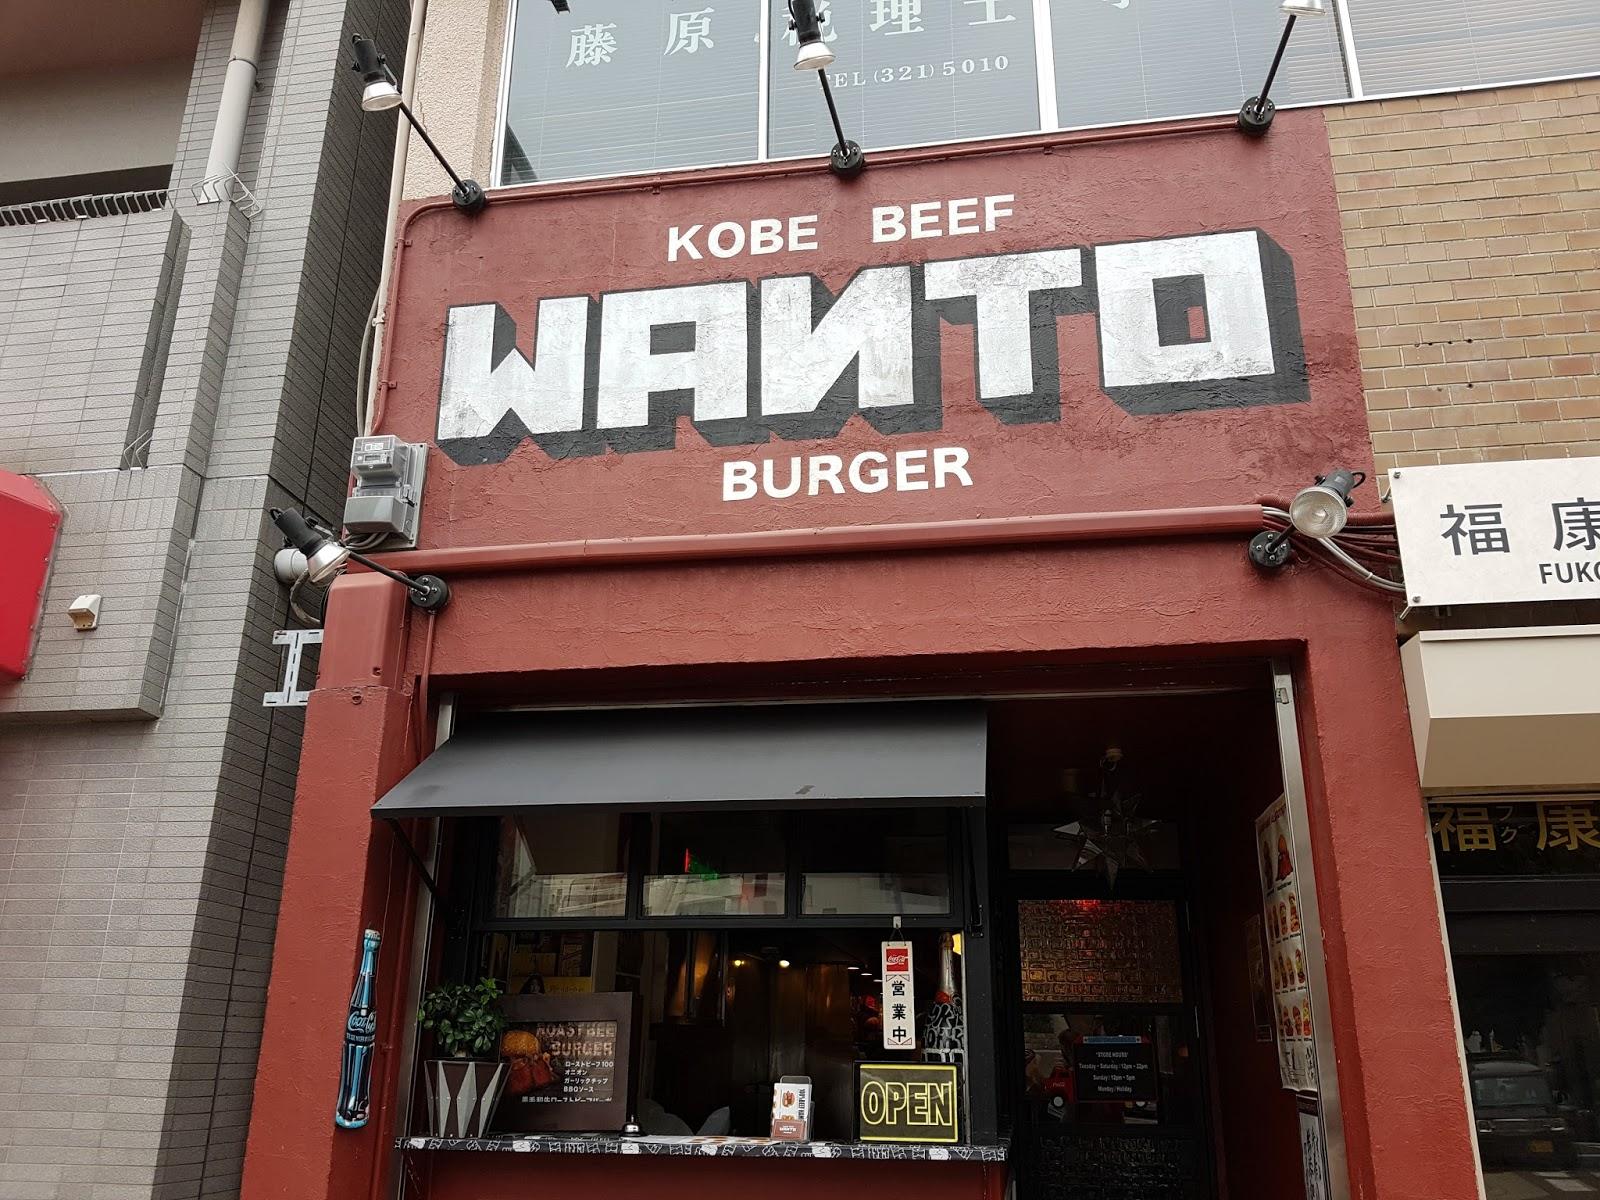 Wanto Burger, Kobe